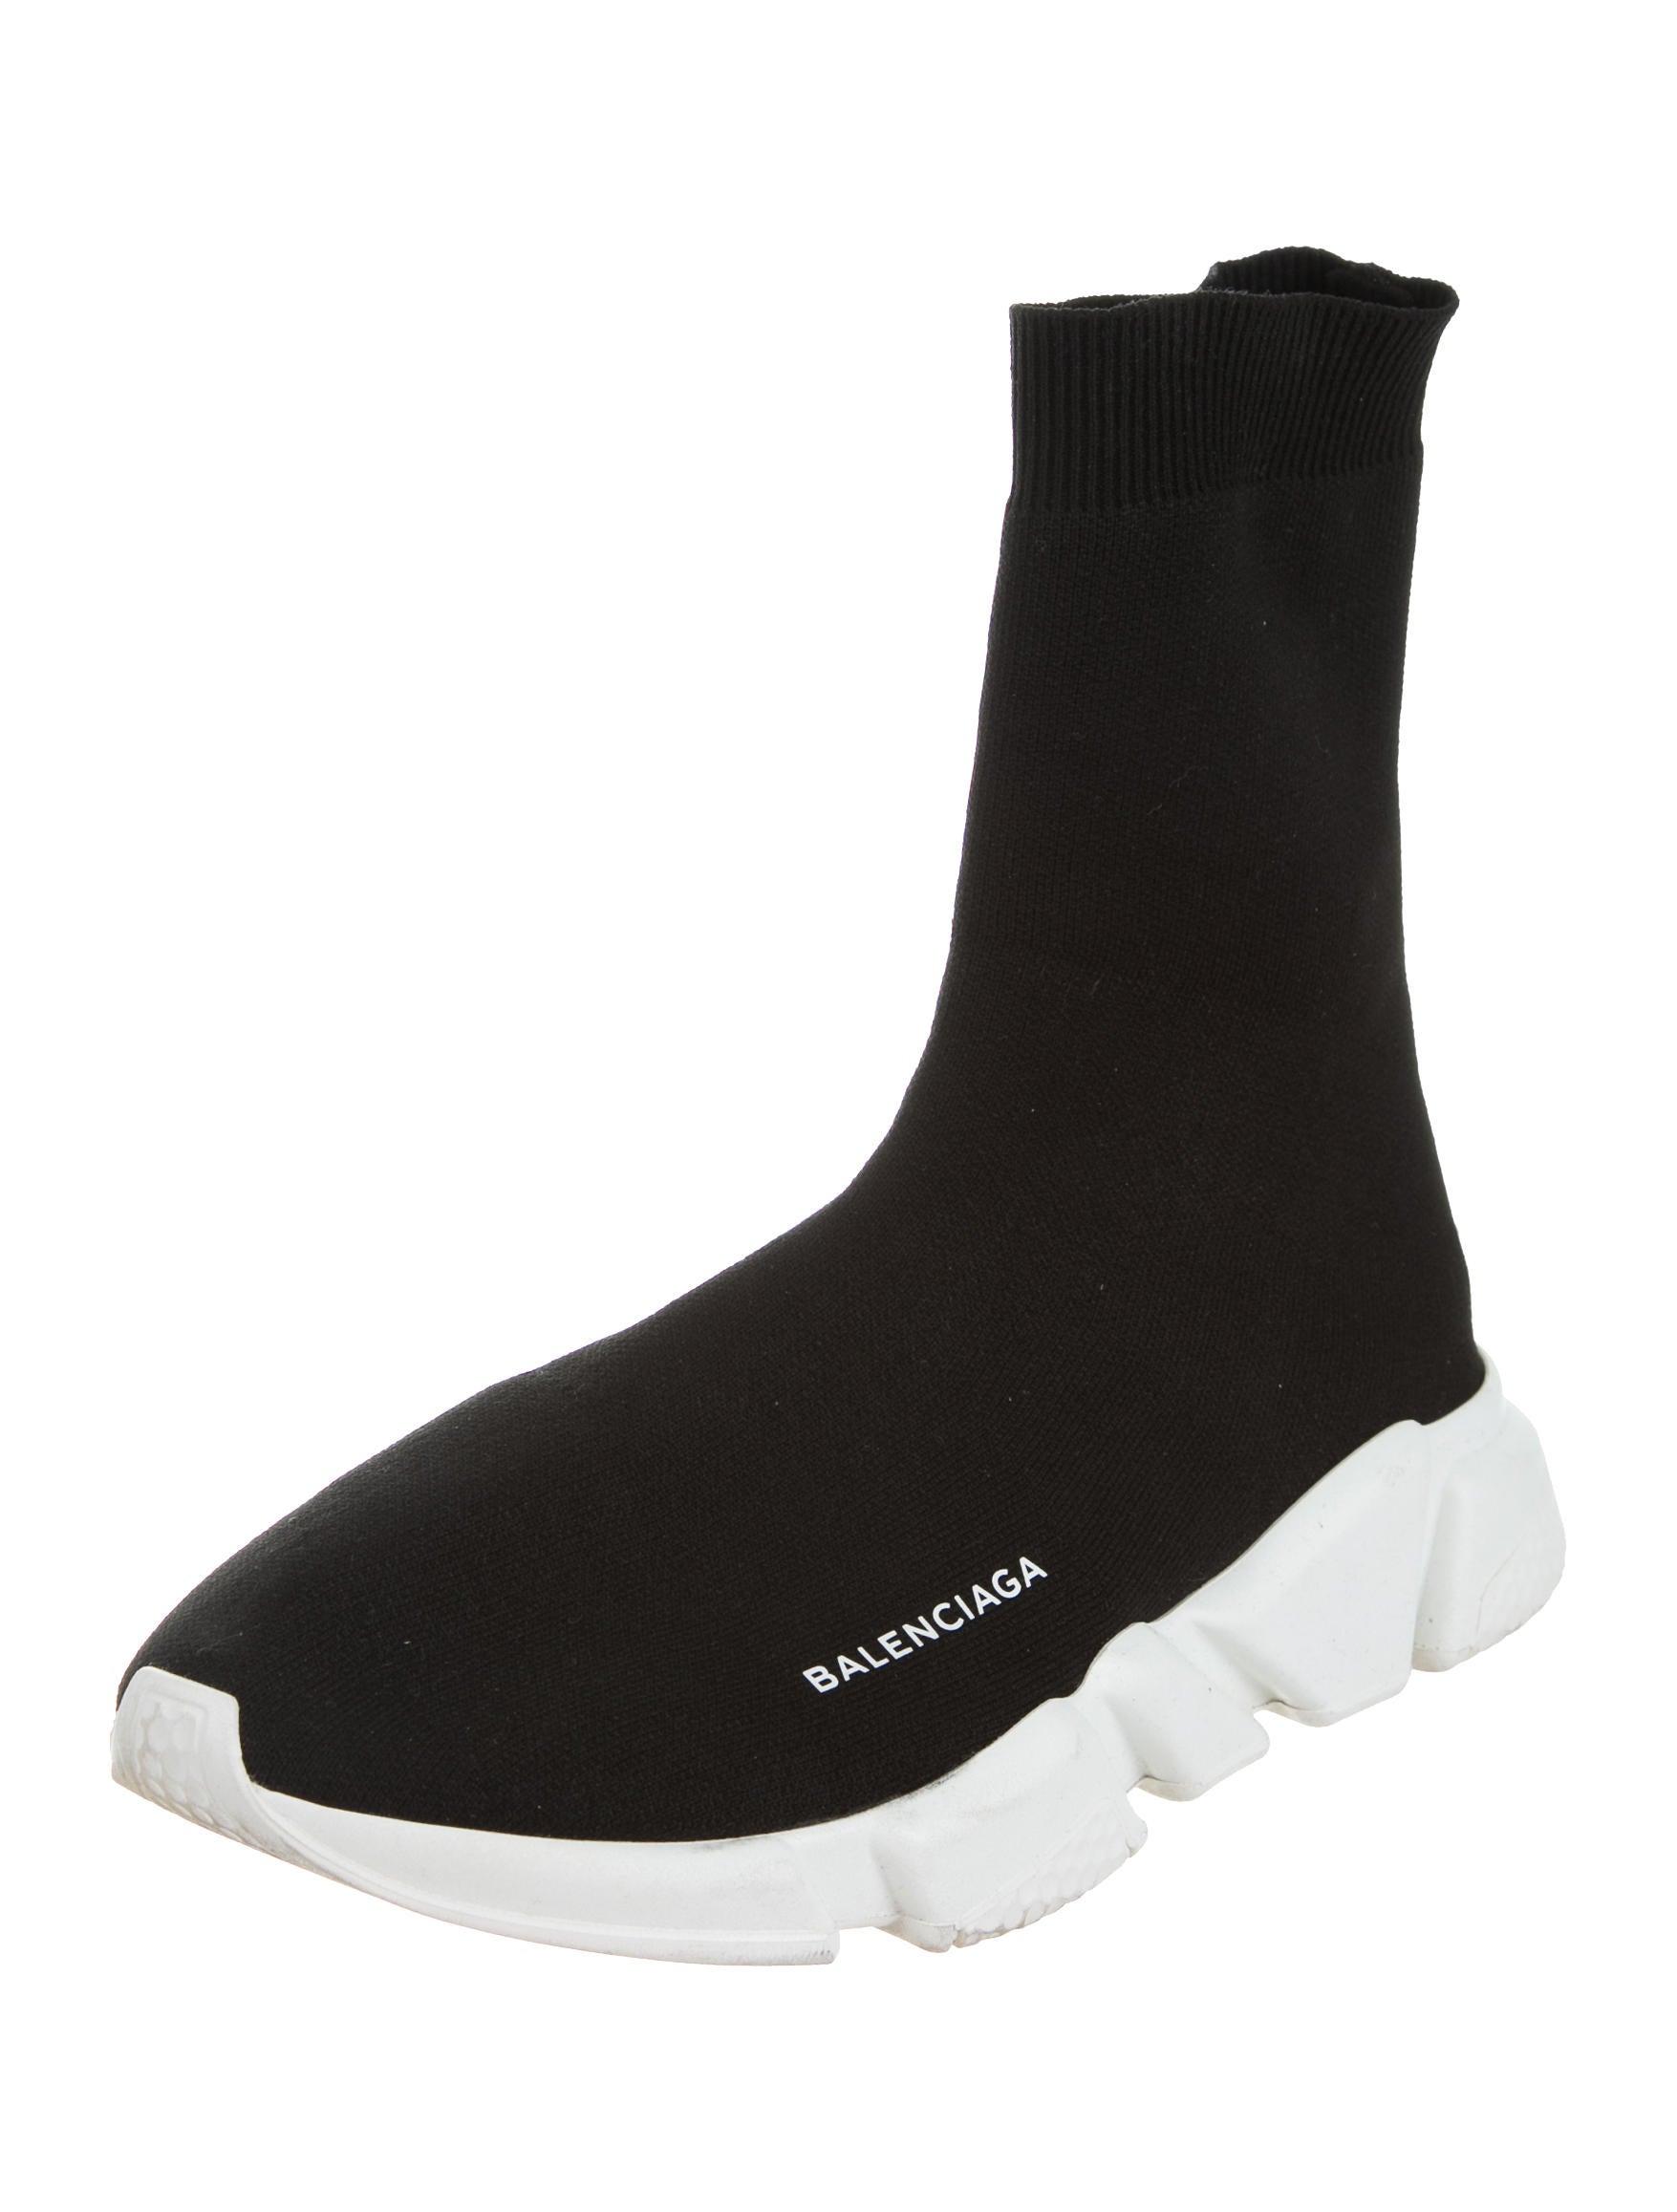 Balenciaga 2017 Knit High Top Sneakers Shoes BAL